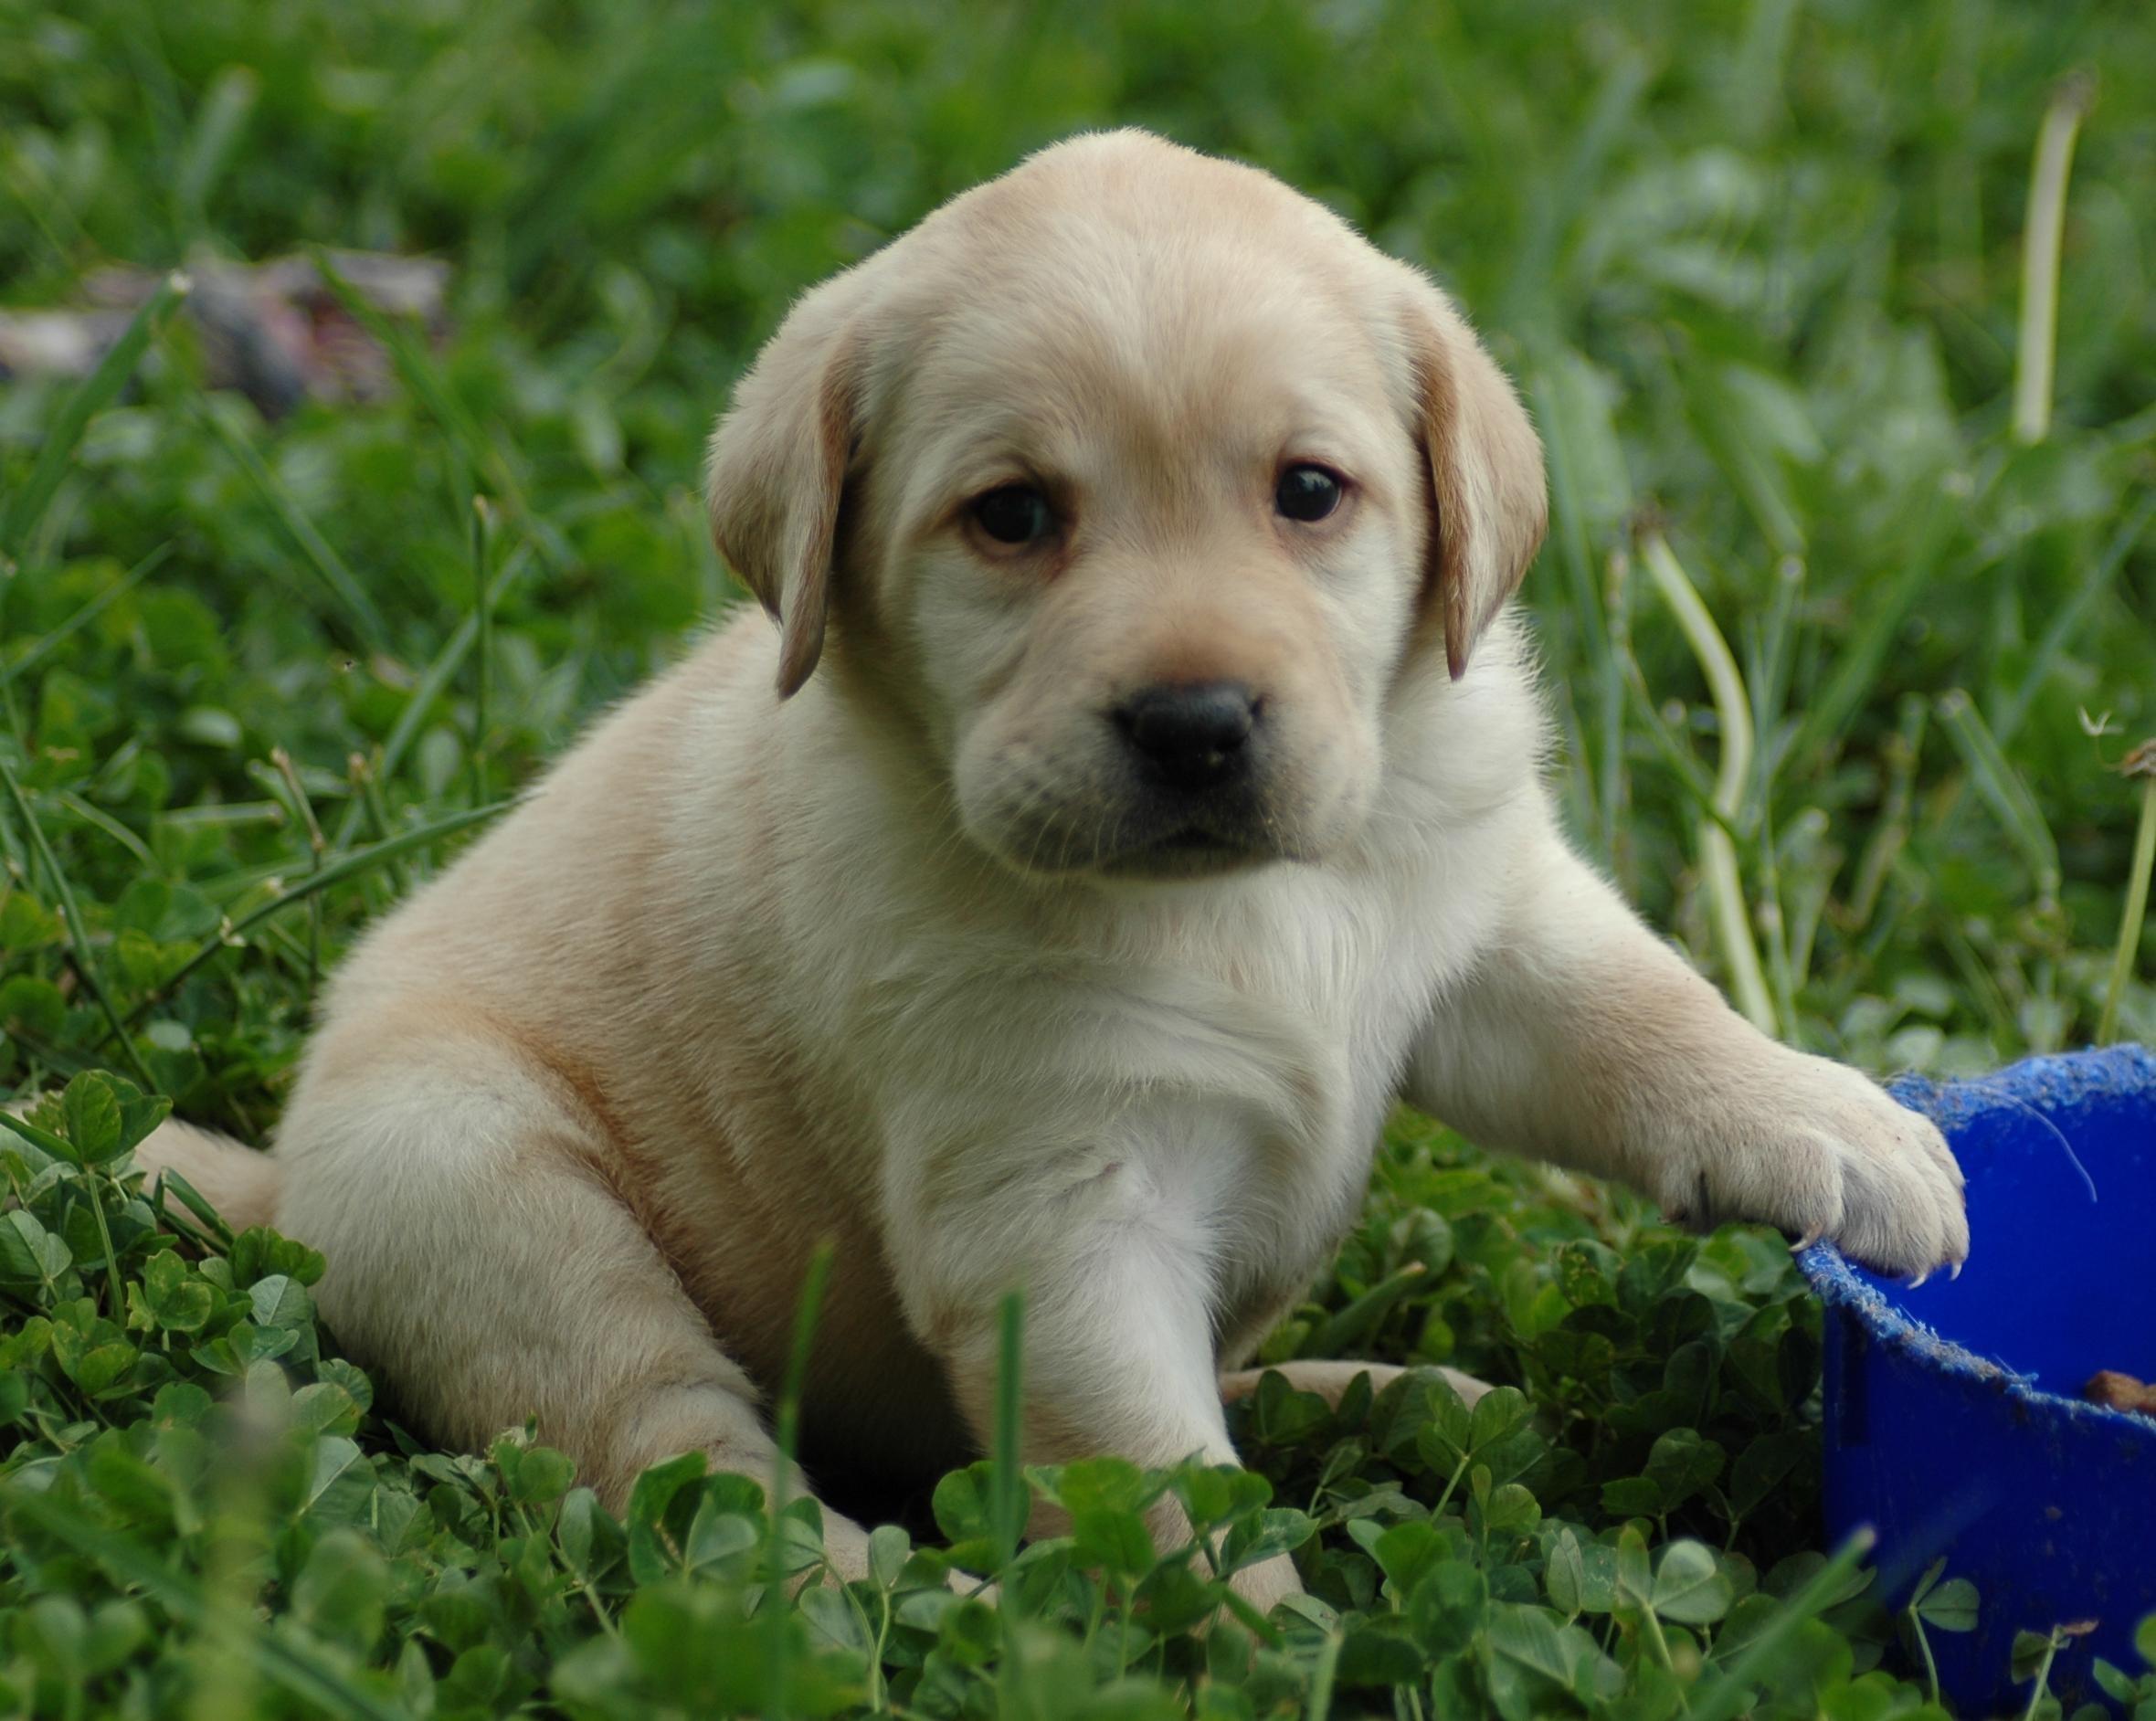 Pitbull Dog Puppy HD Wallpapers | Pitbull Puppy Dogs Desktop .